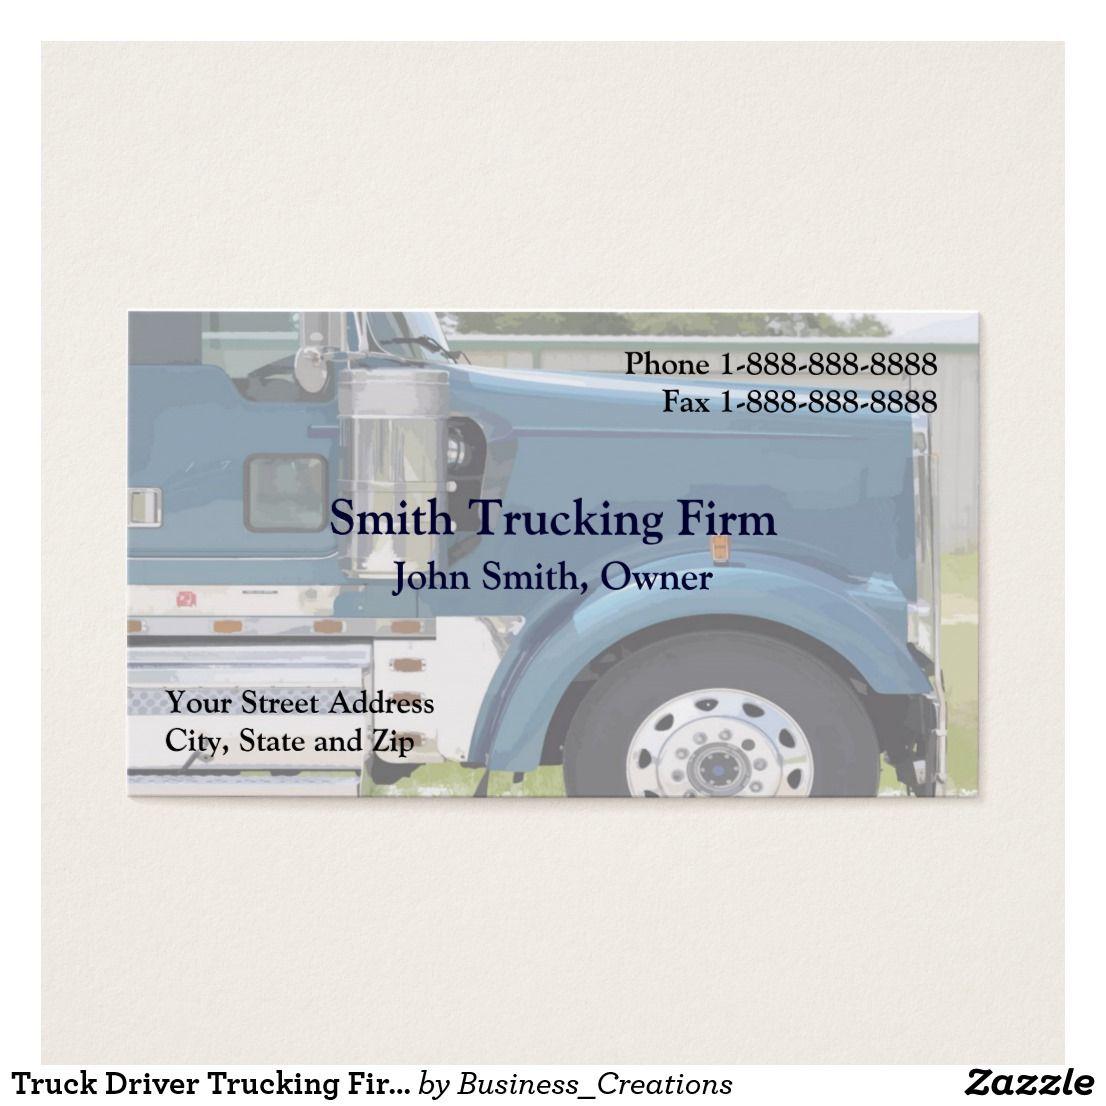 Truck Driver Trucking Firm Business Card   Business cards